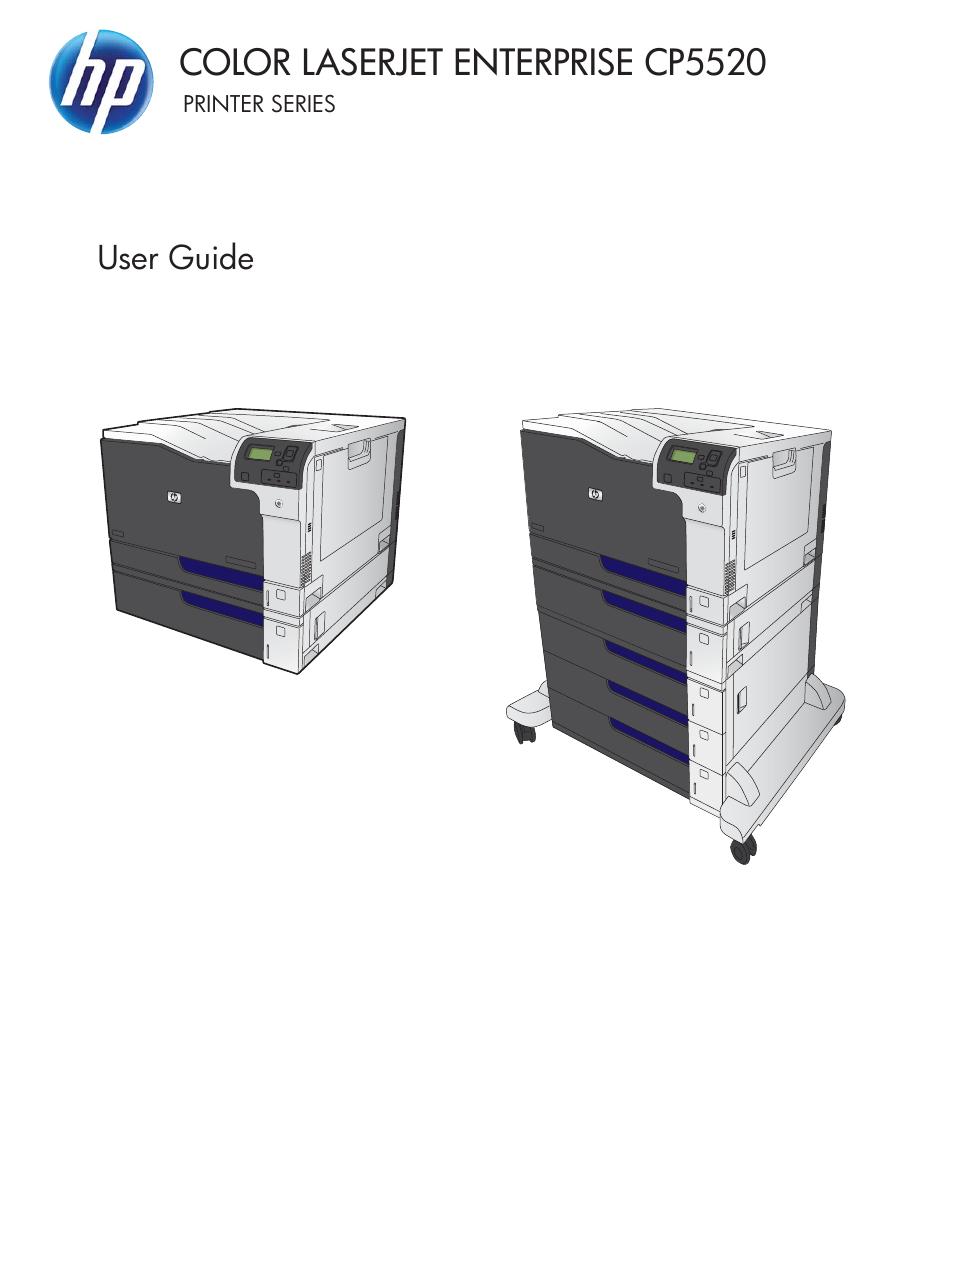 HP Color LaserJet Enterprise CP5525 Printer series User Manual | 262 pages